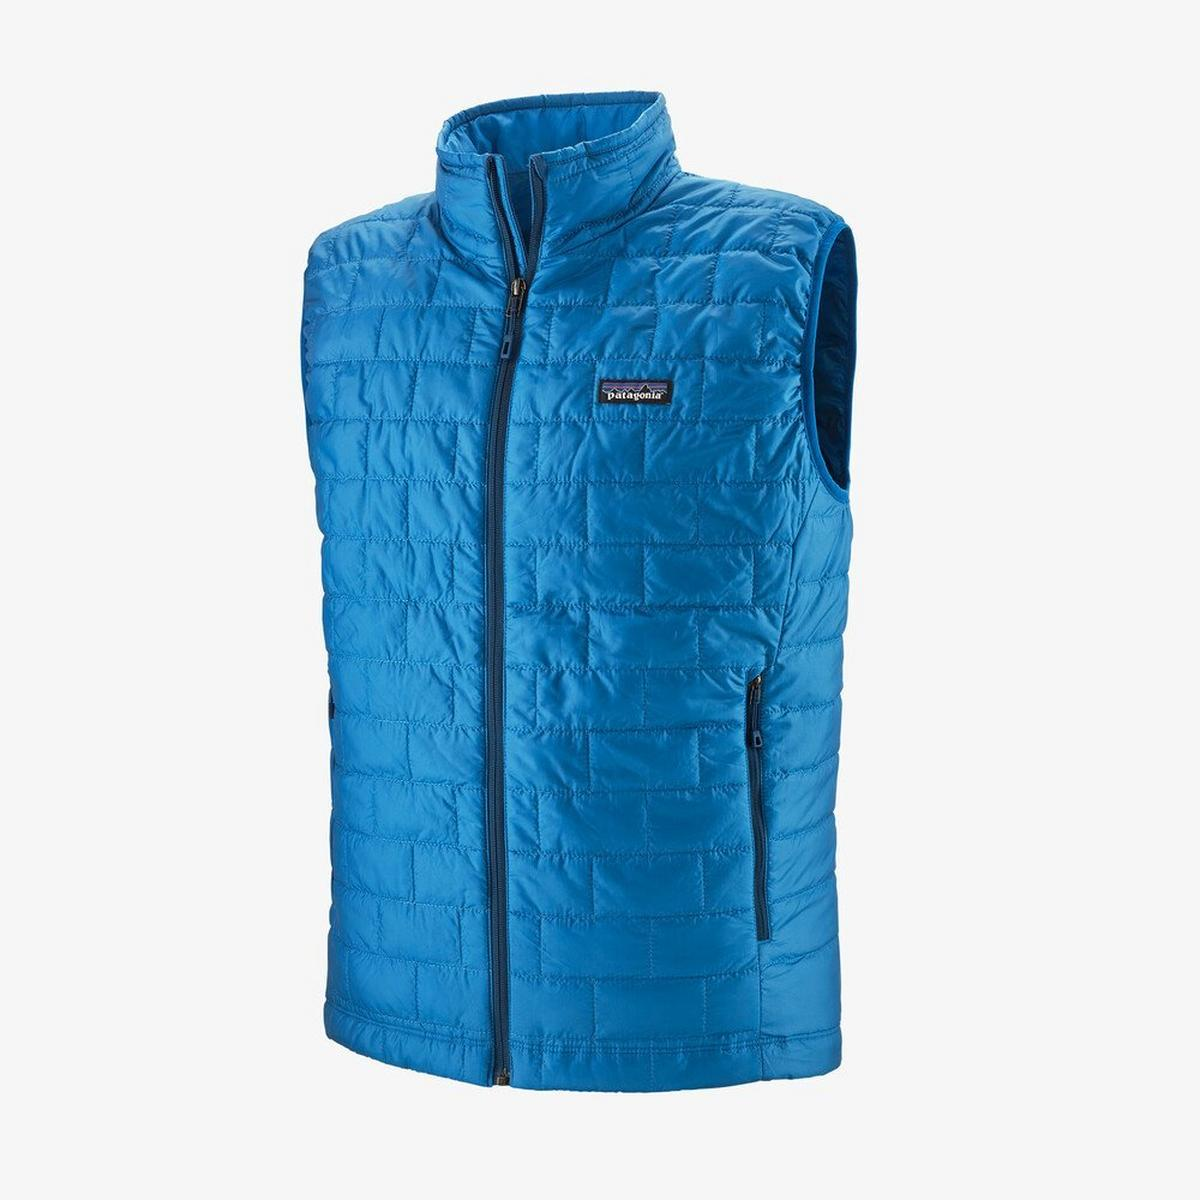 Patagonia Men's Patagonia Nano Puff Vest - Blue